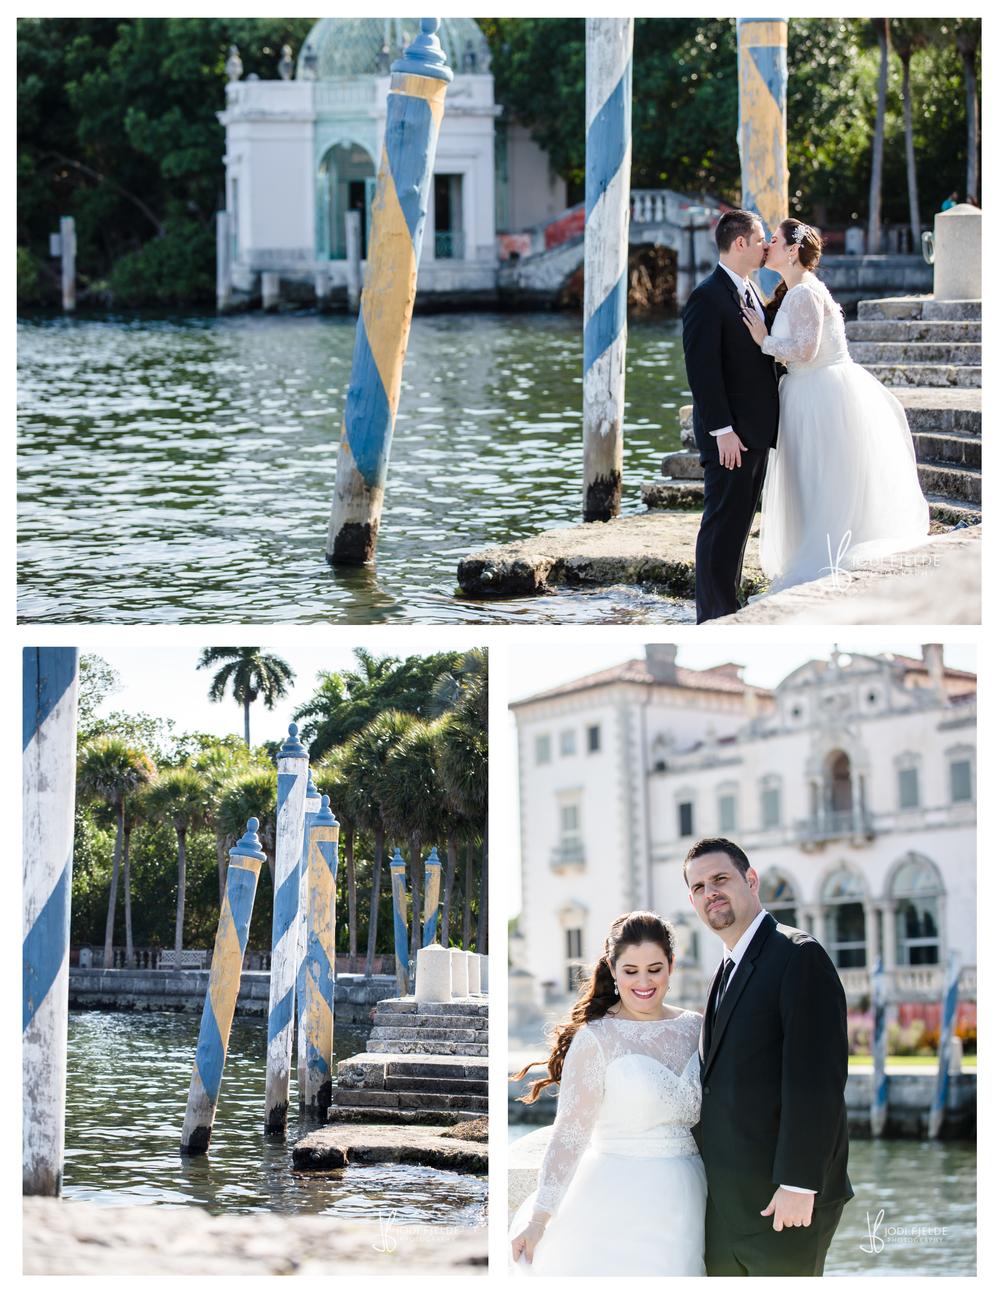 Vizcaya_Miami_Florida_Bridal_Wedding_Portraits_Jodi_Fjelde_Photography-9.jpg